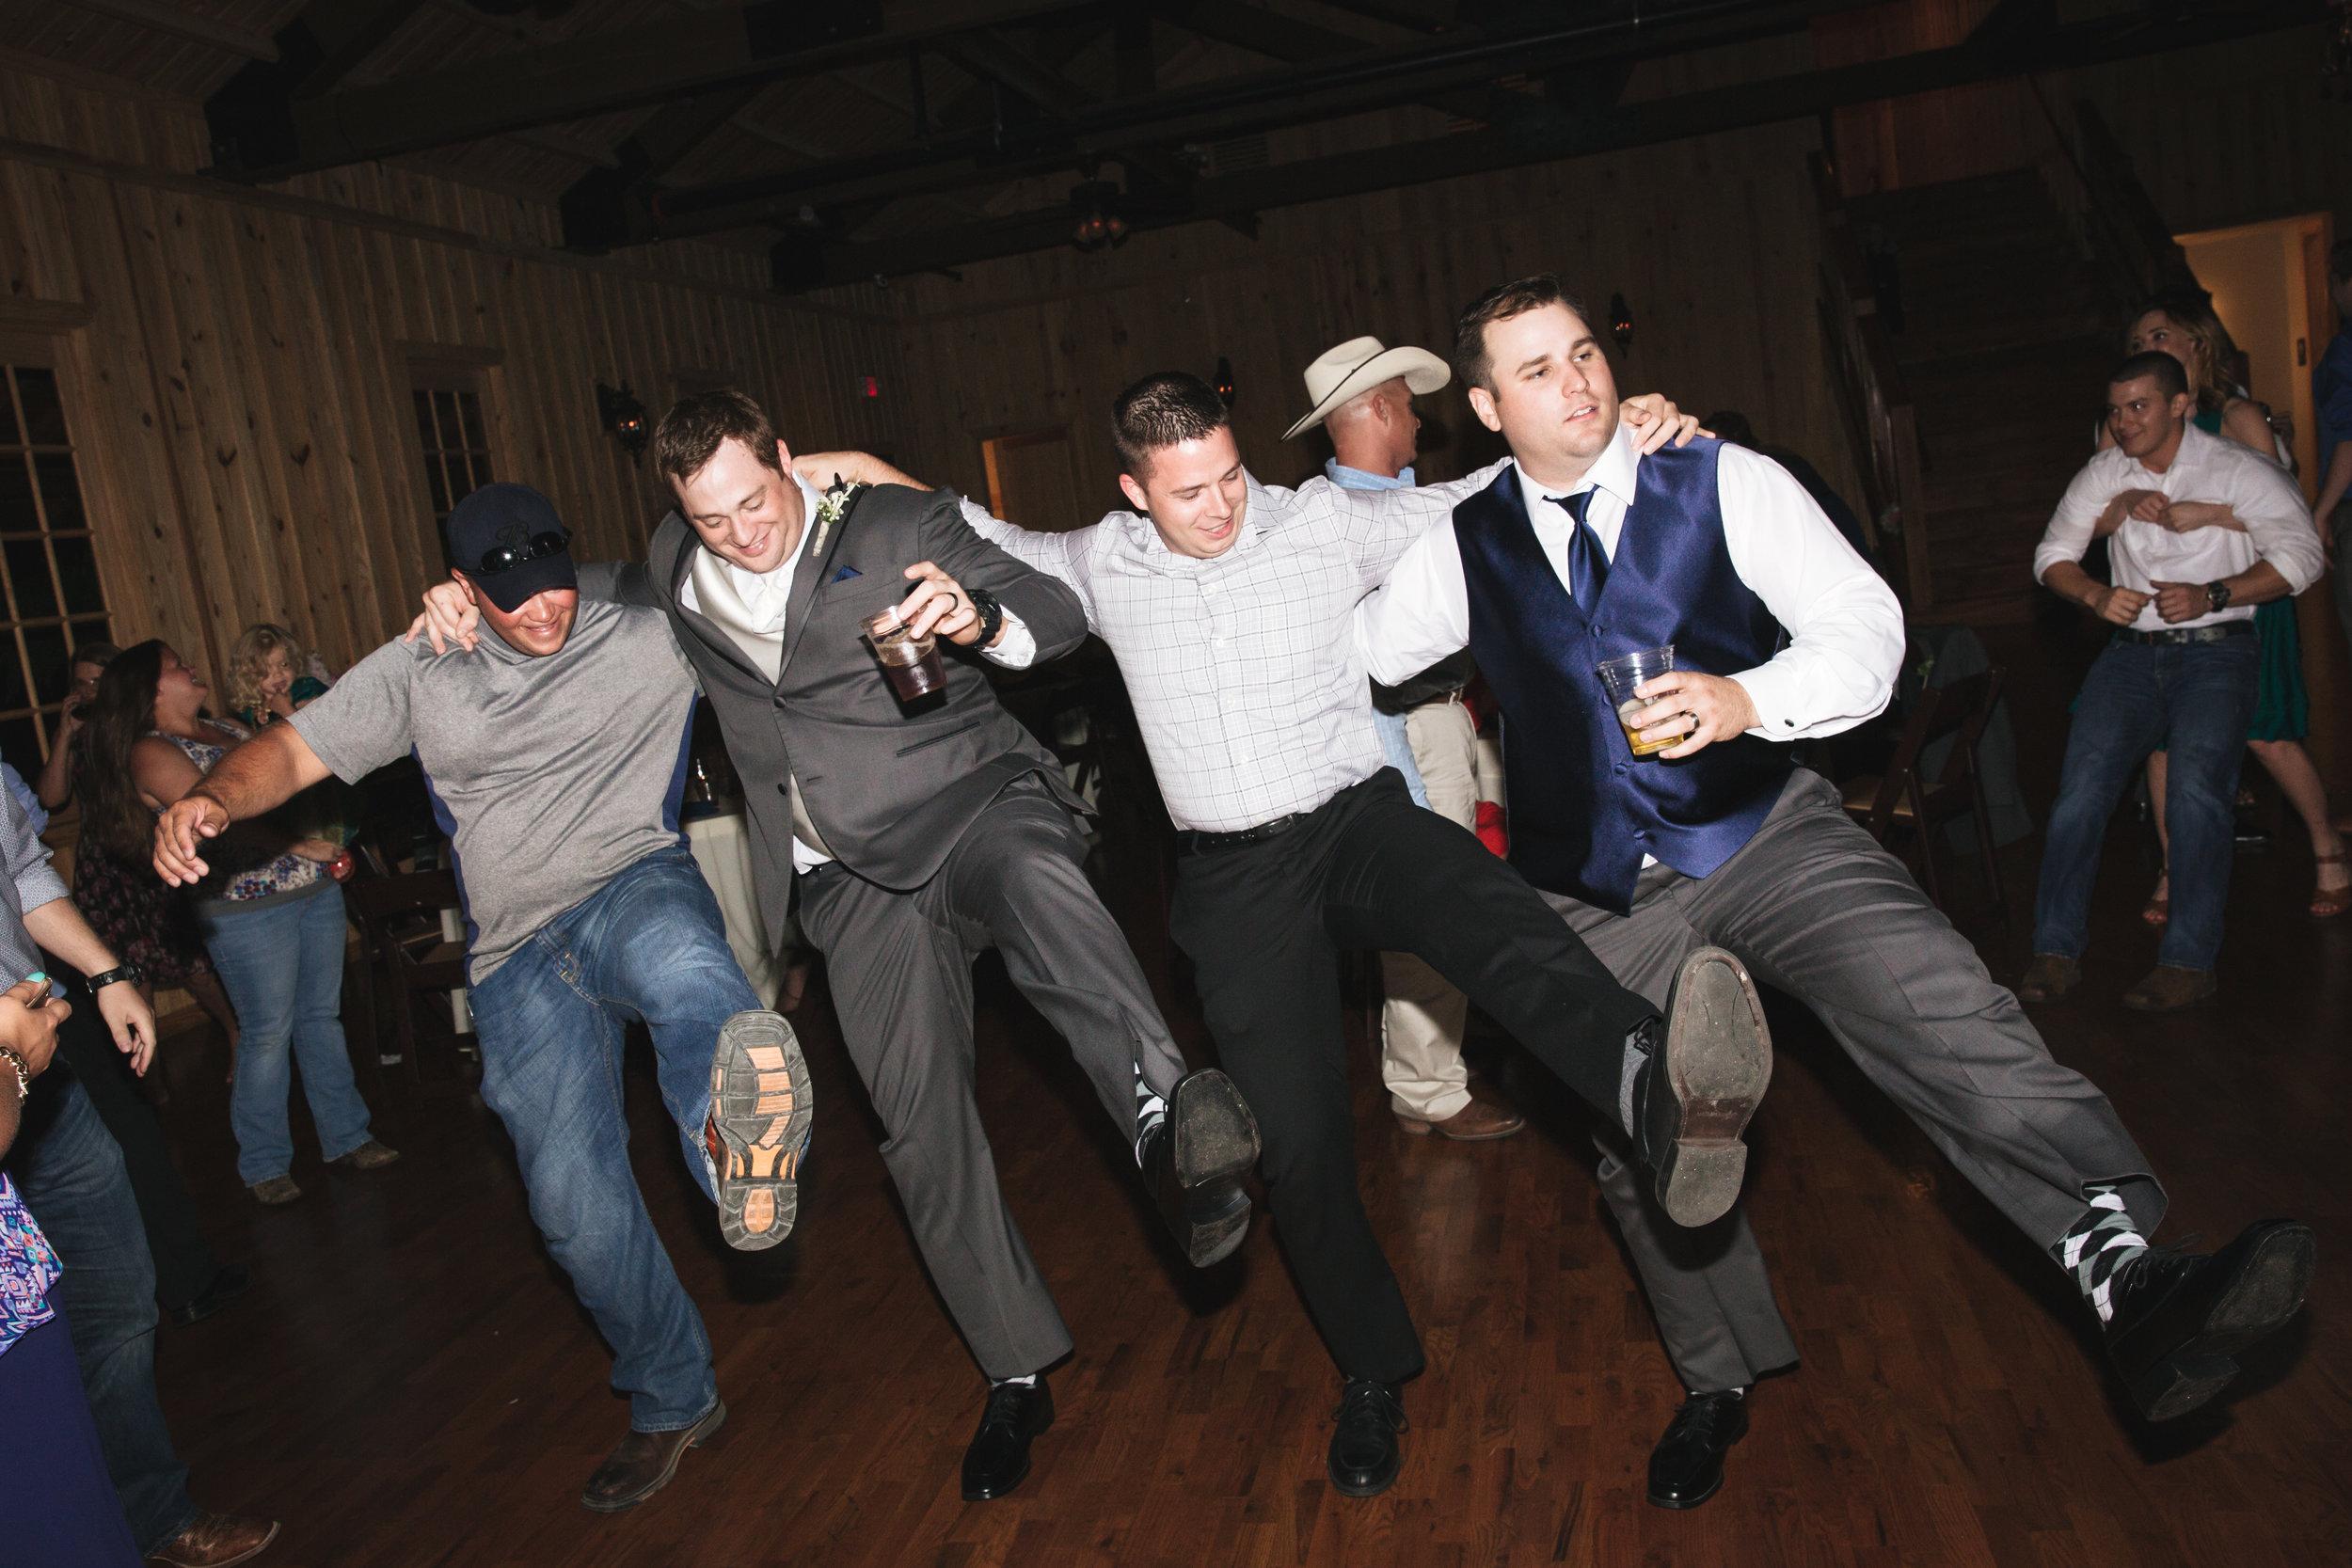 Wedding_DentonTX.jpg